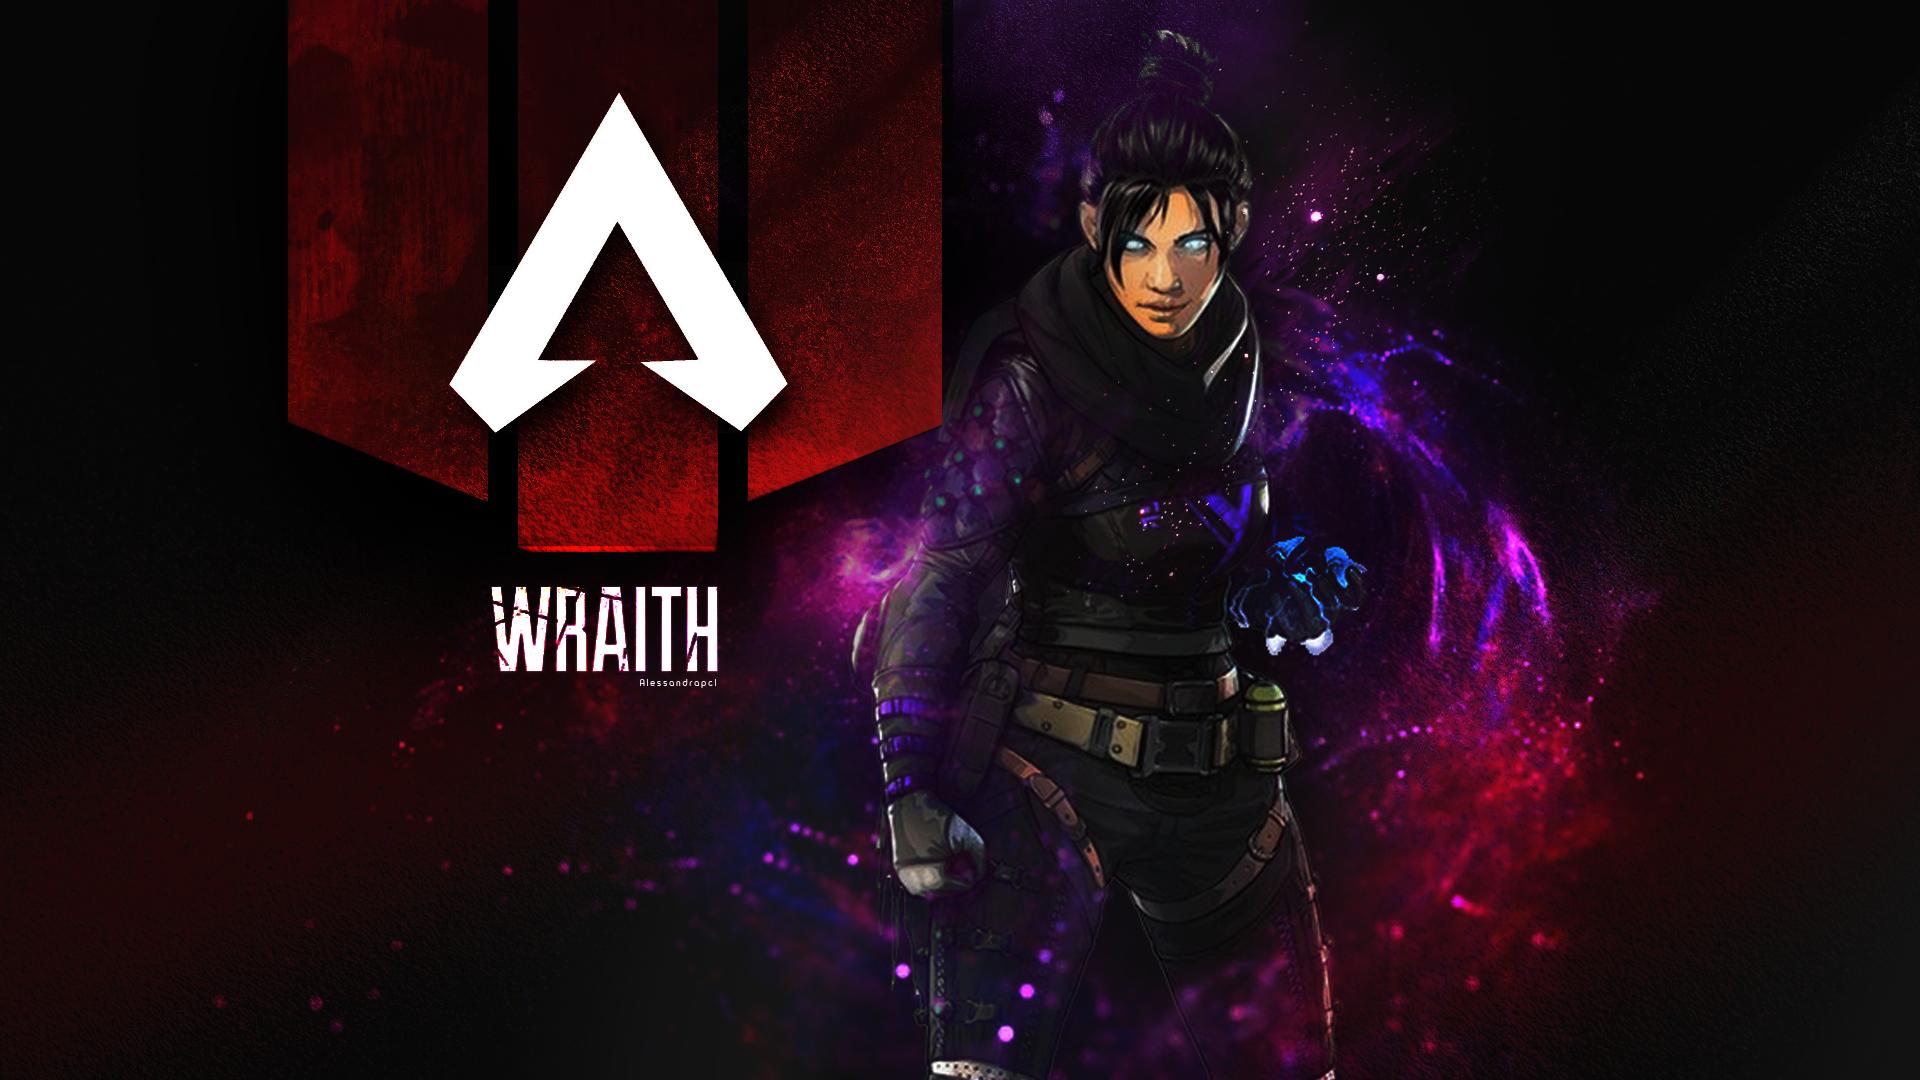 Wraith Apex Legends! FanArt by alessandrapcl (instagram